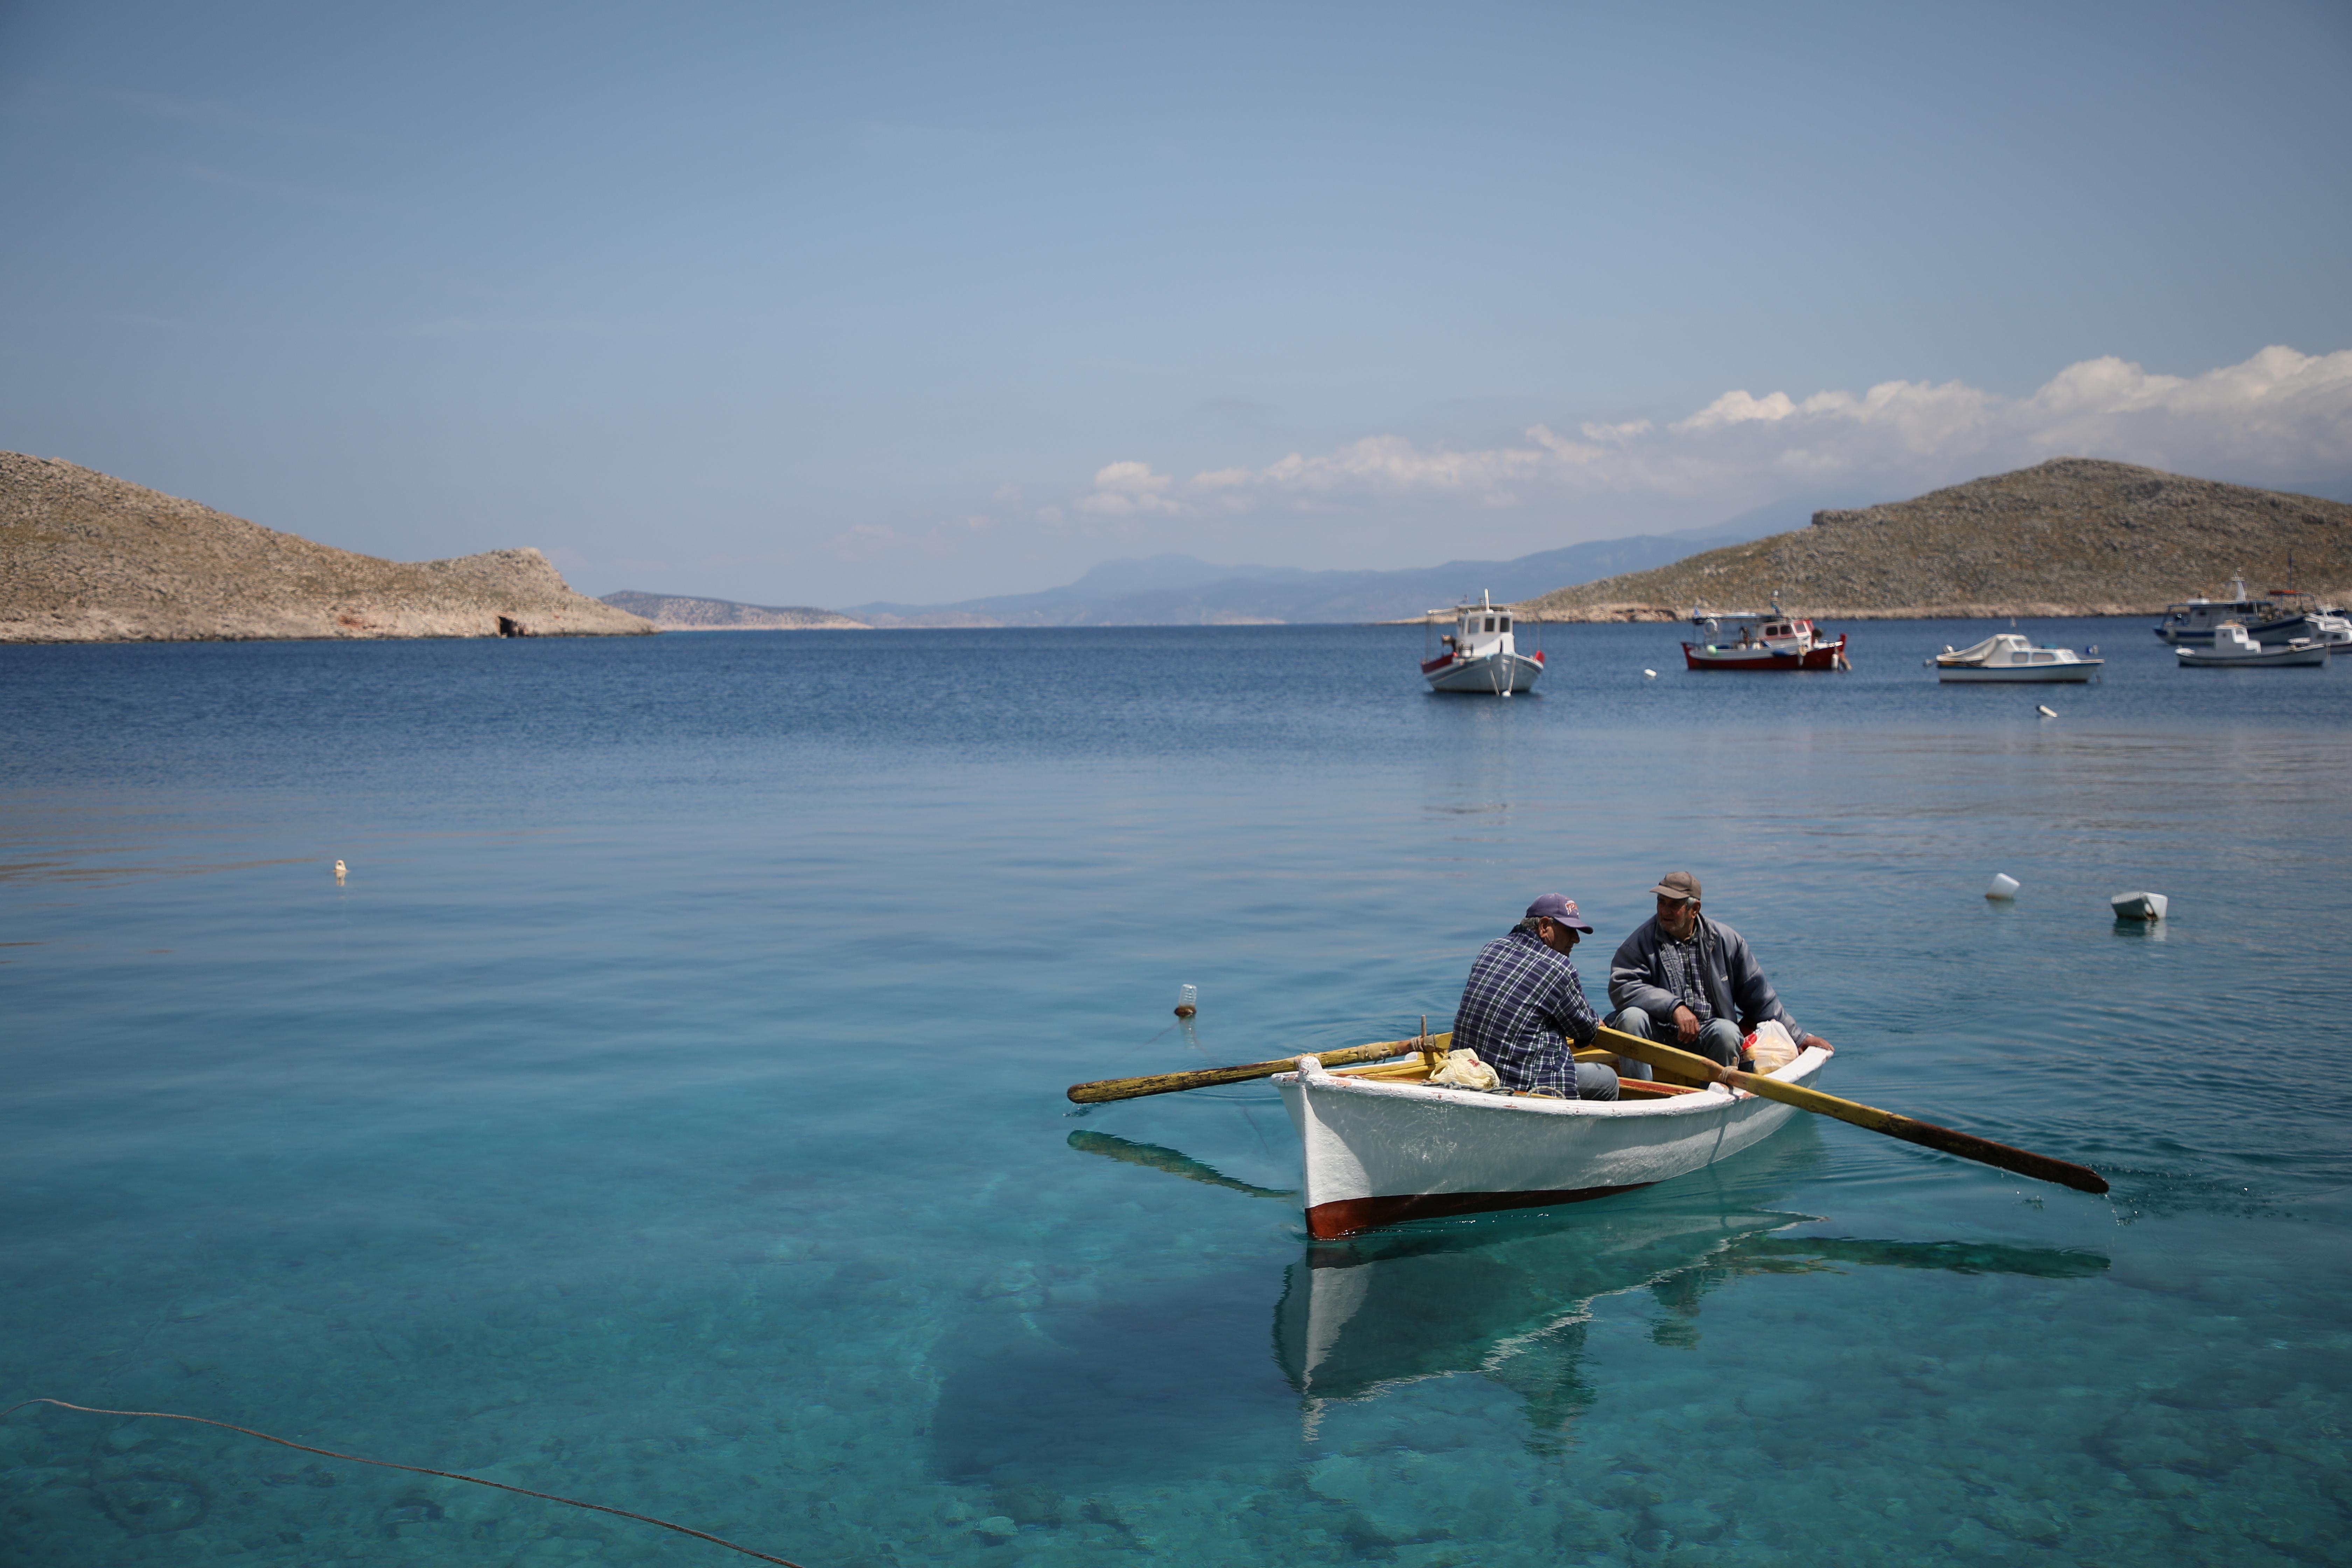 Two fishermen leave the port of Halki on their boat, amid the coronavirus disease (COVID-19) pandemic, on the island of Halki, Greece, April 13, 2021. REUTERS/Louiza Vradi